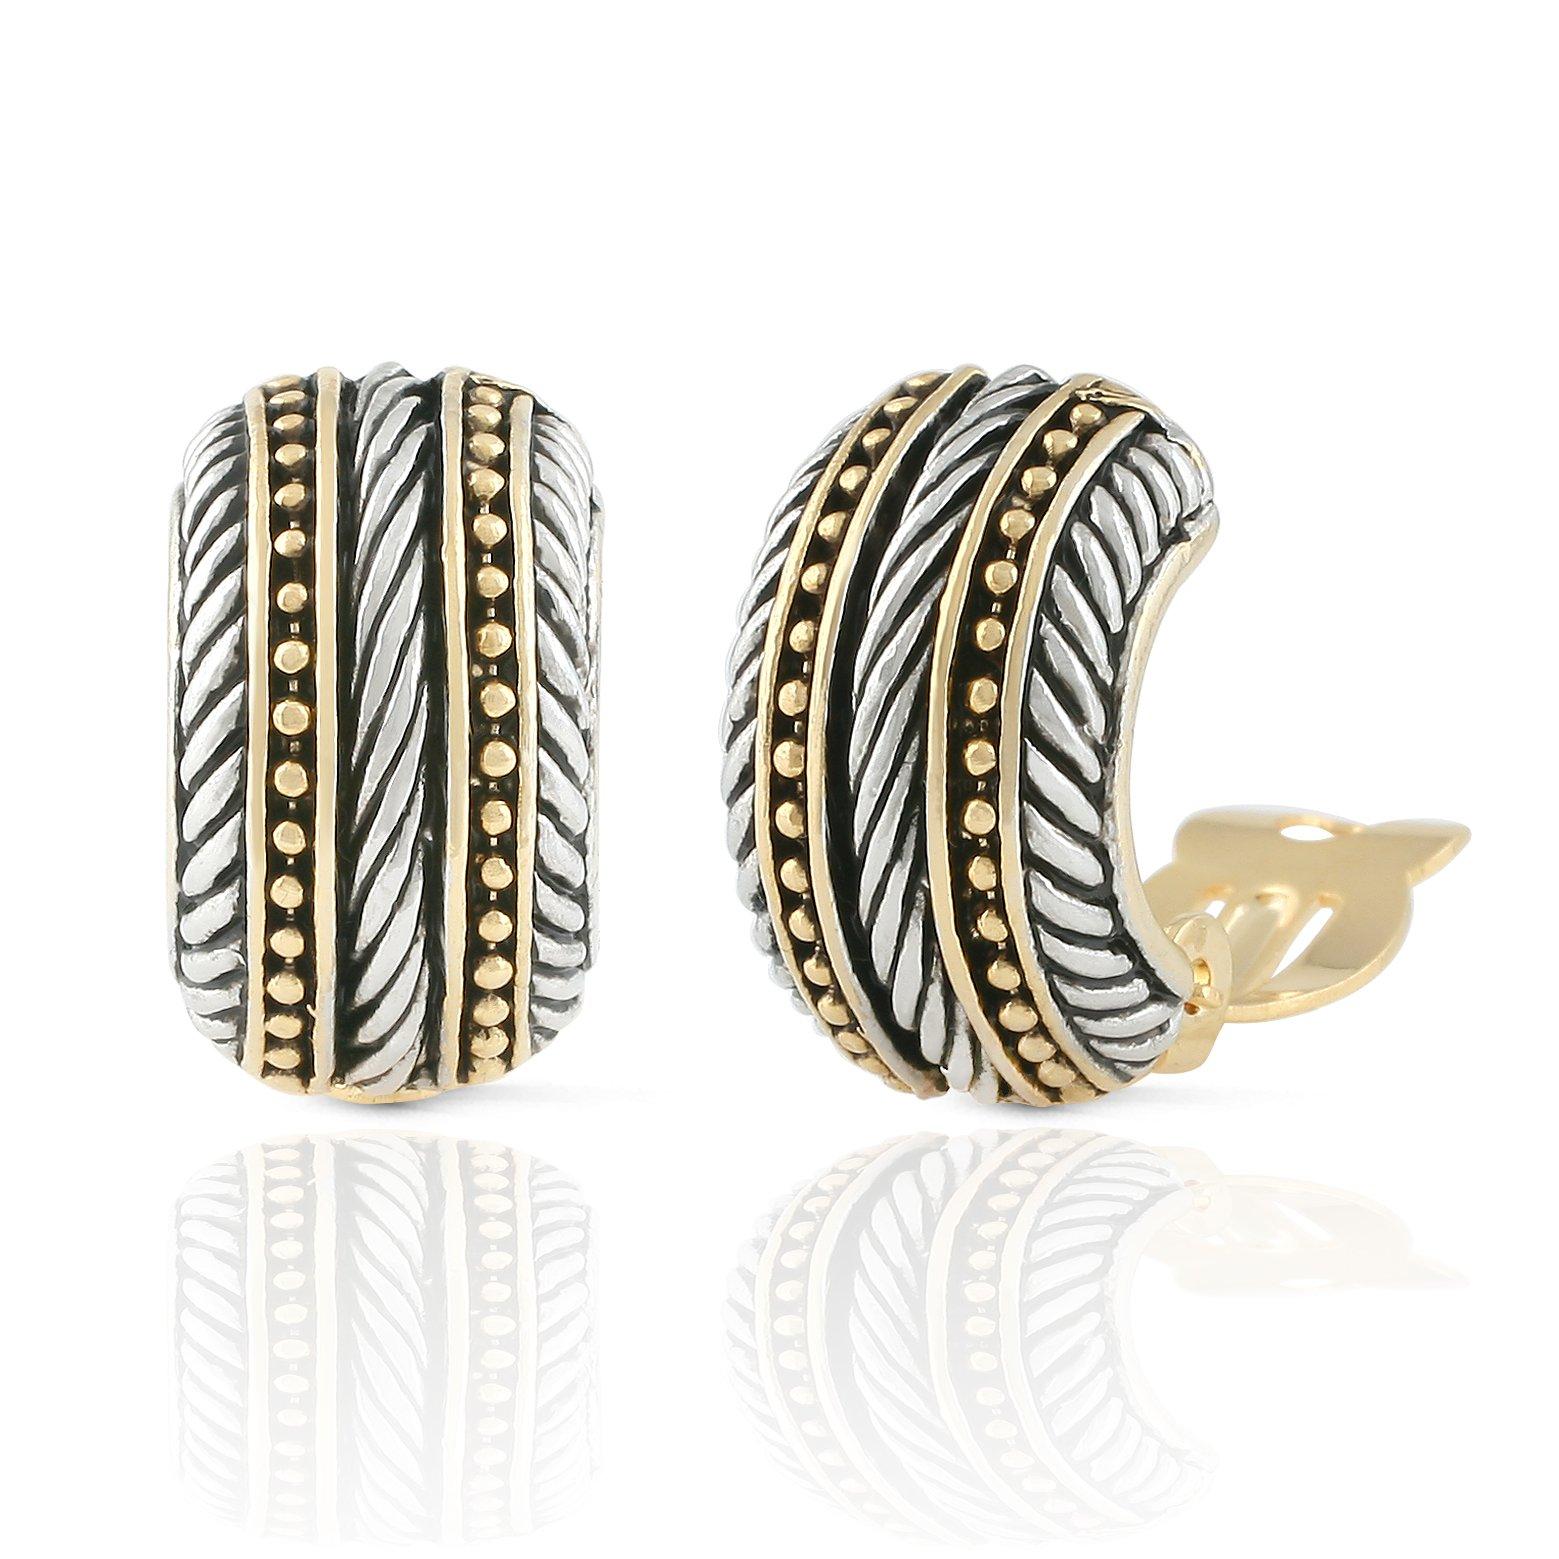 JanKuo Jewelry Two Tone Bali Antique Style Symmetrical Shape Clip On Earrings